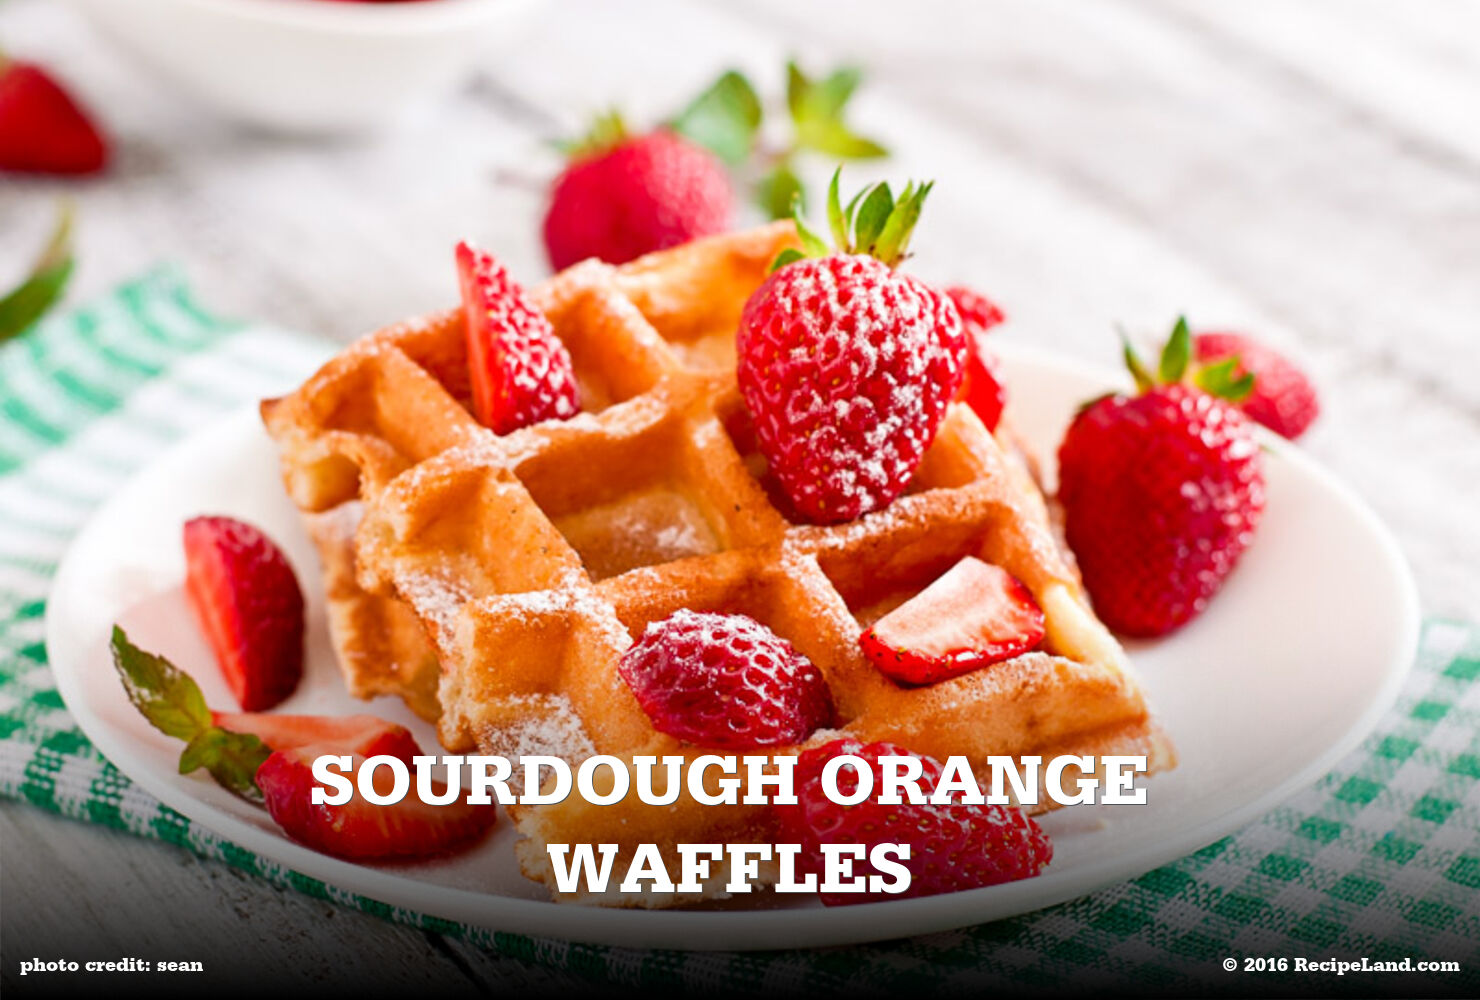 Sourdough Orange Waffles